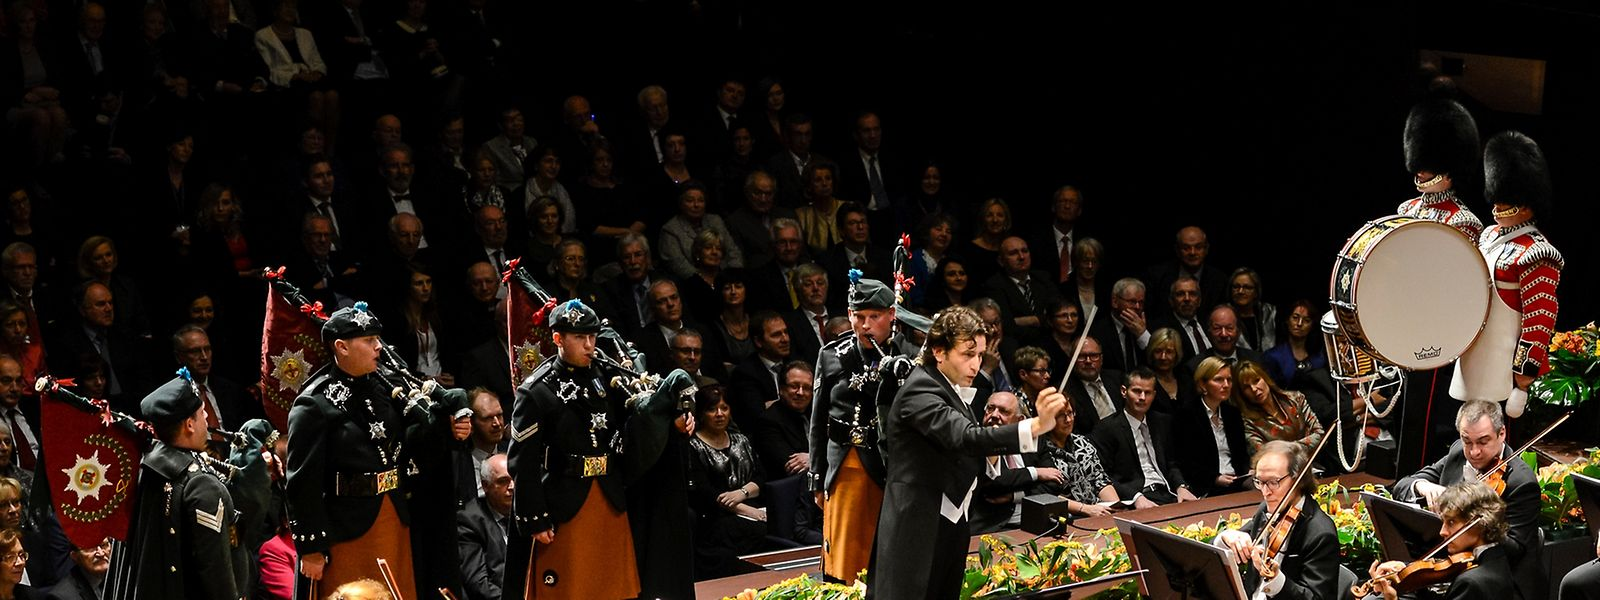 Les «Irish Guards», Gustavo Gimeno et l'OPL souhaitent un «Happy Birthday» au souverain.